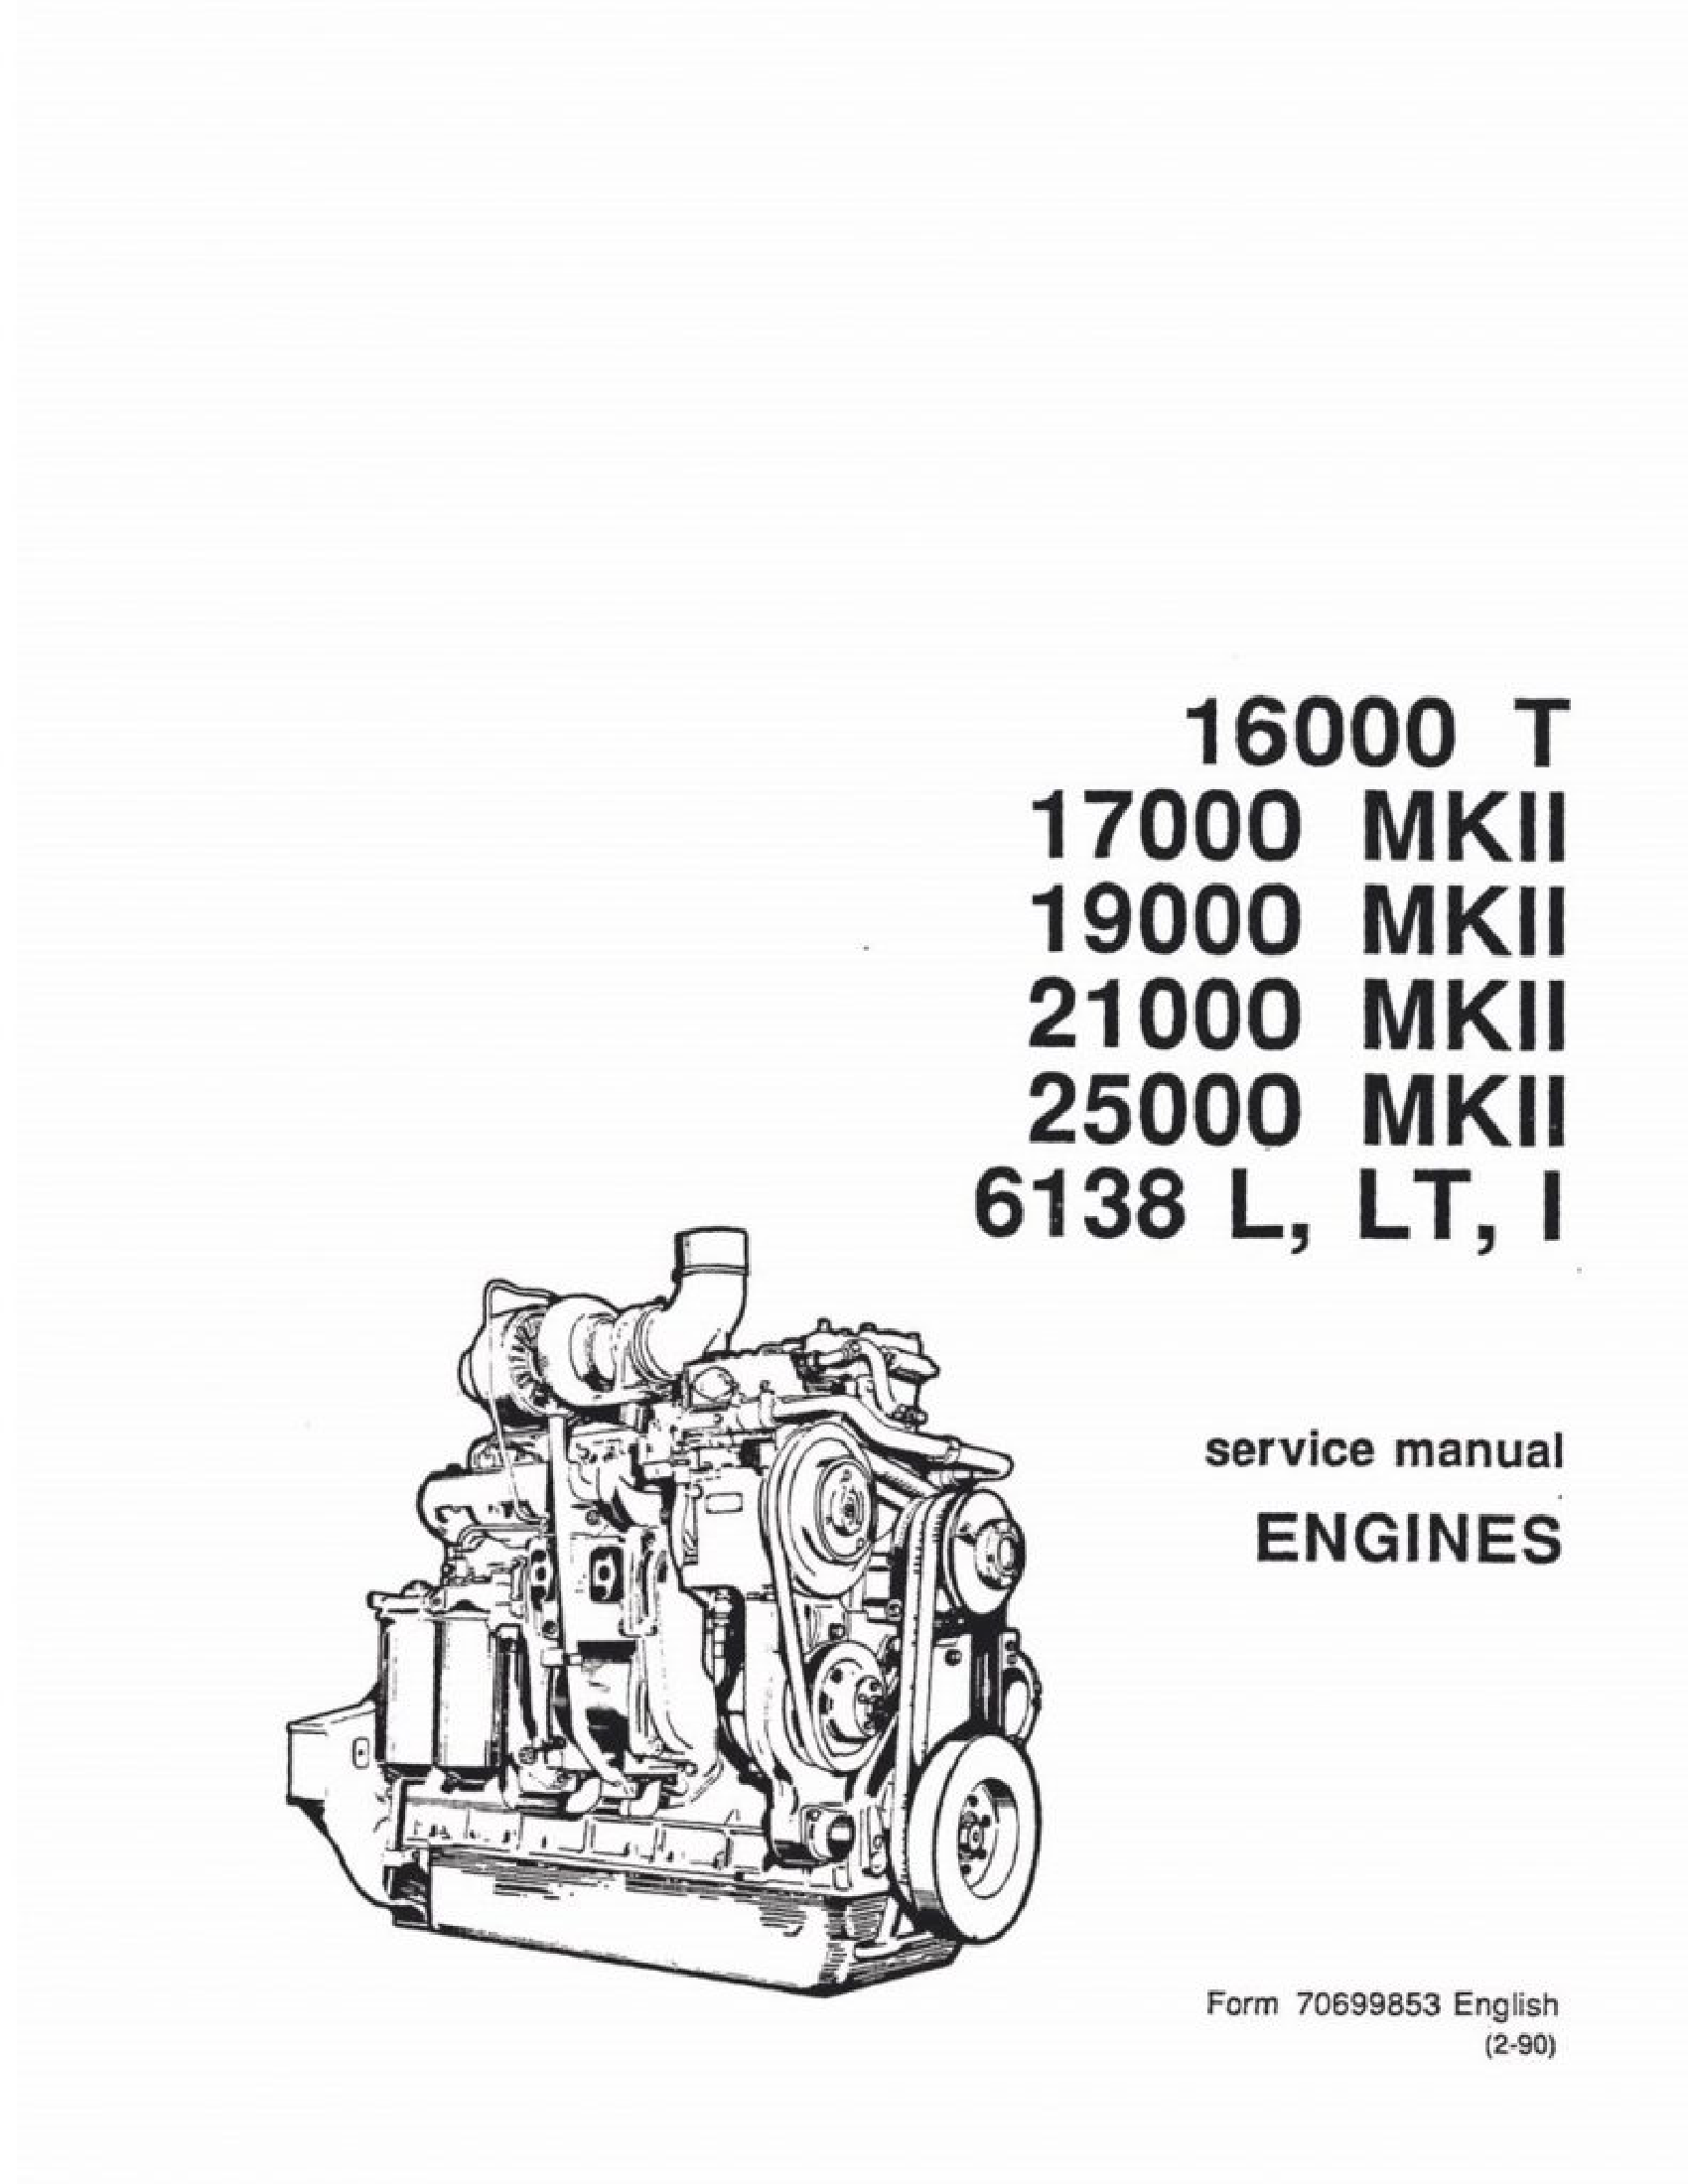 Fiat-Allis 16000 Engine manual